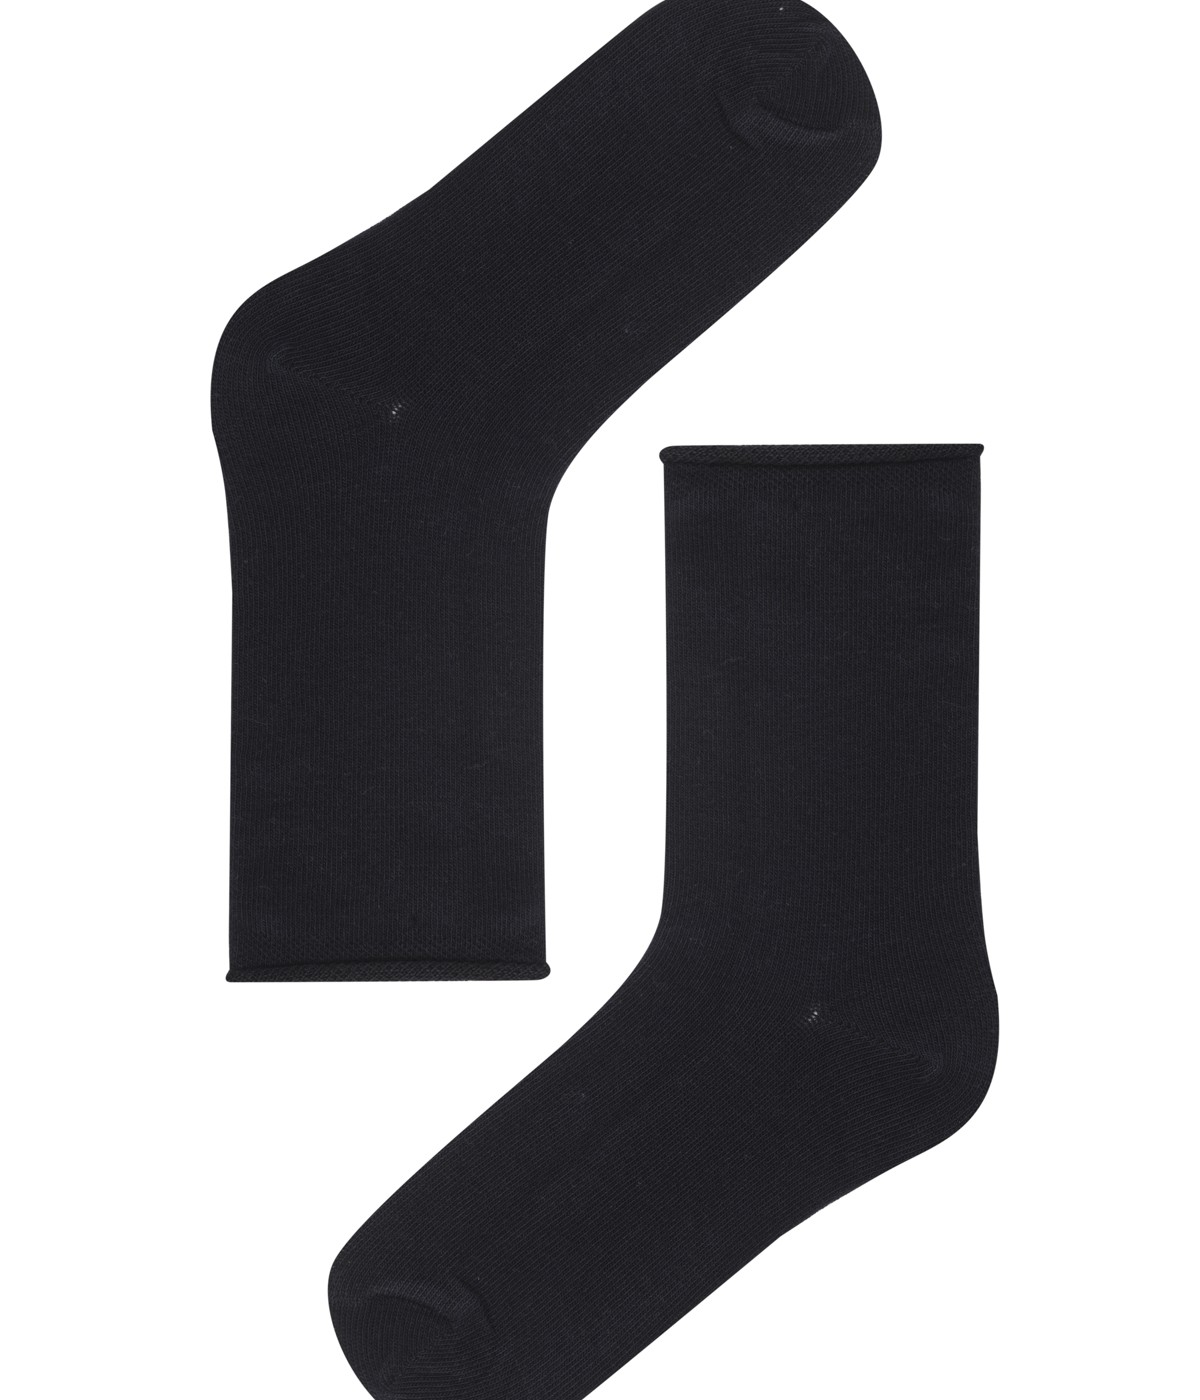 Girls Basic 3 in 1 Socks